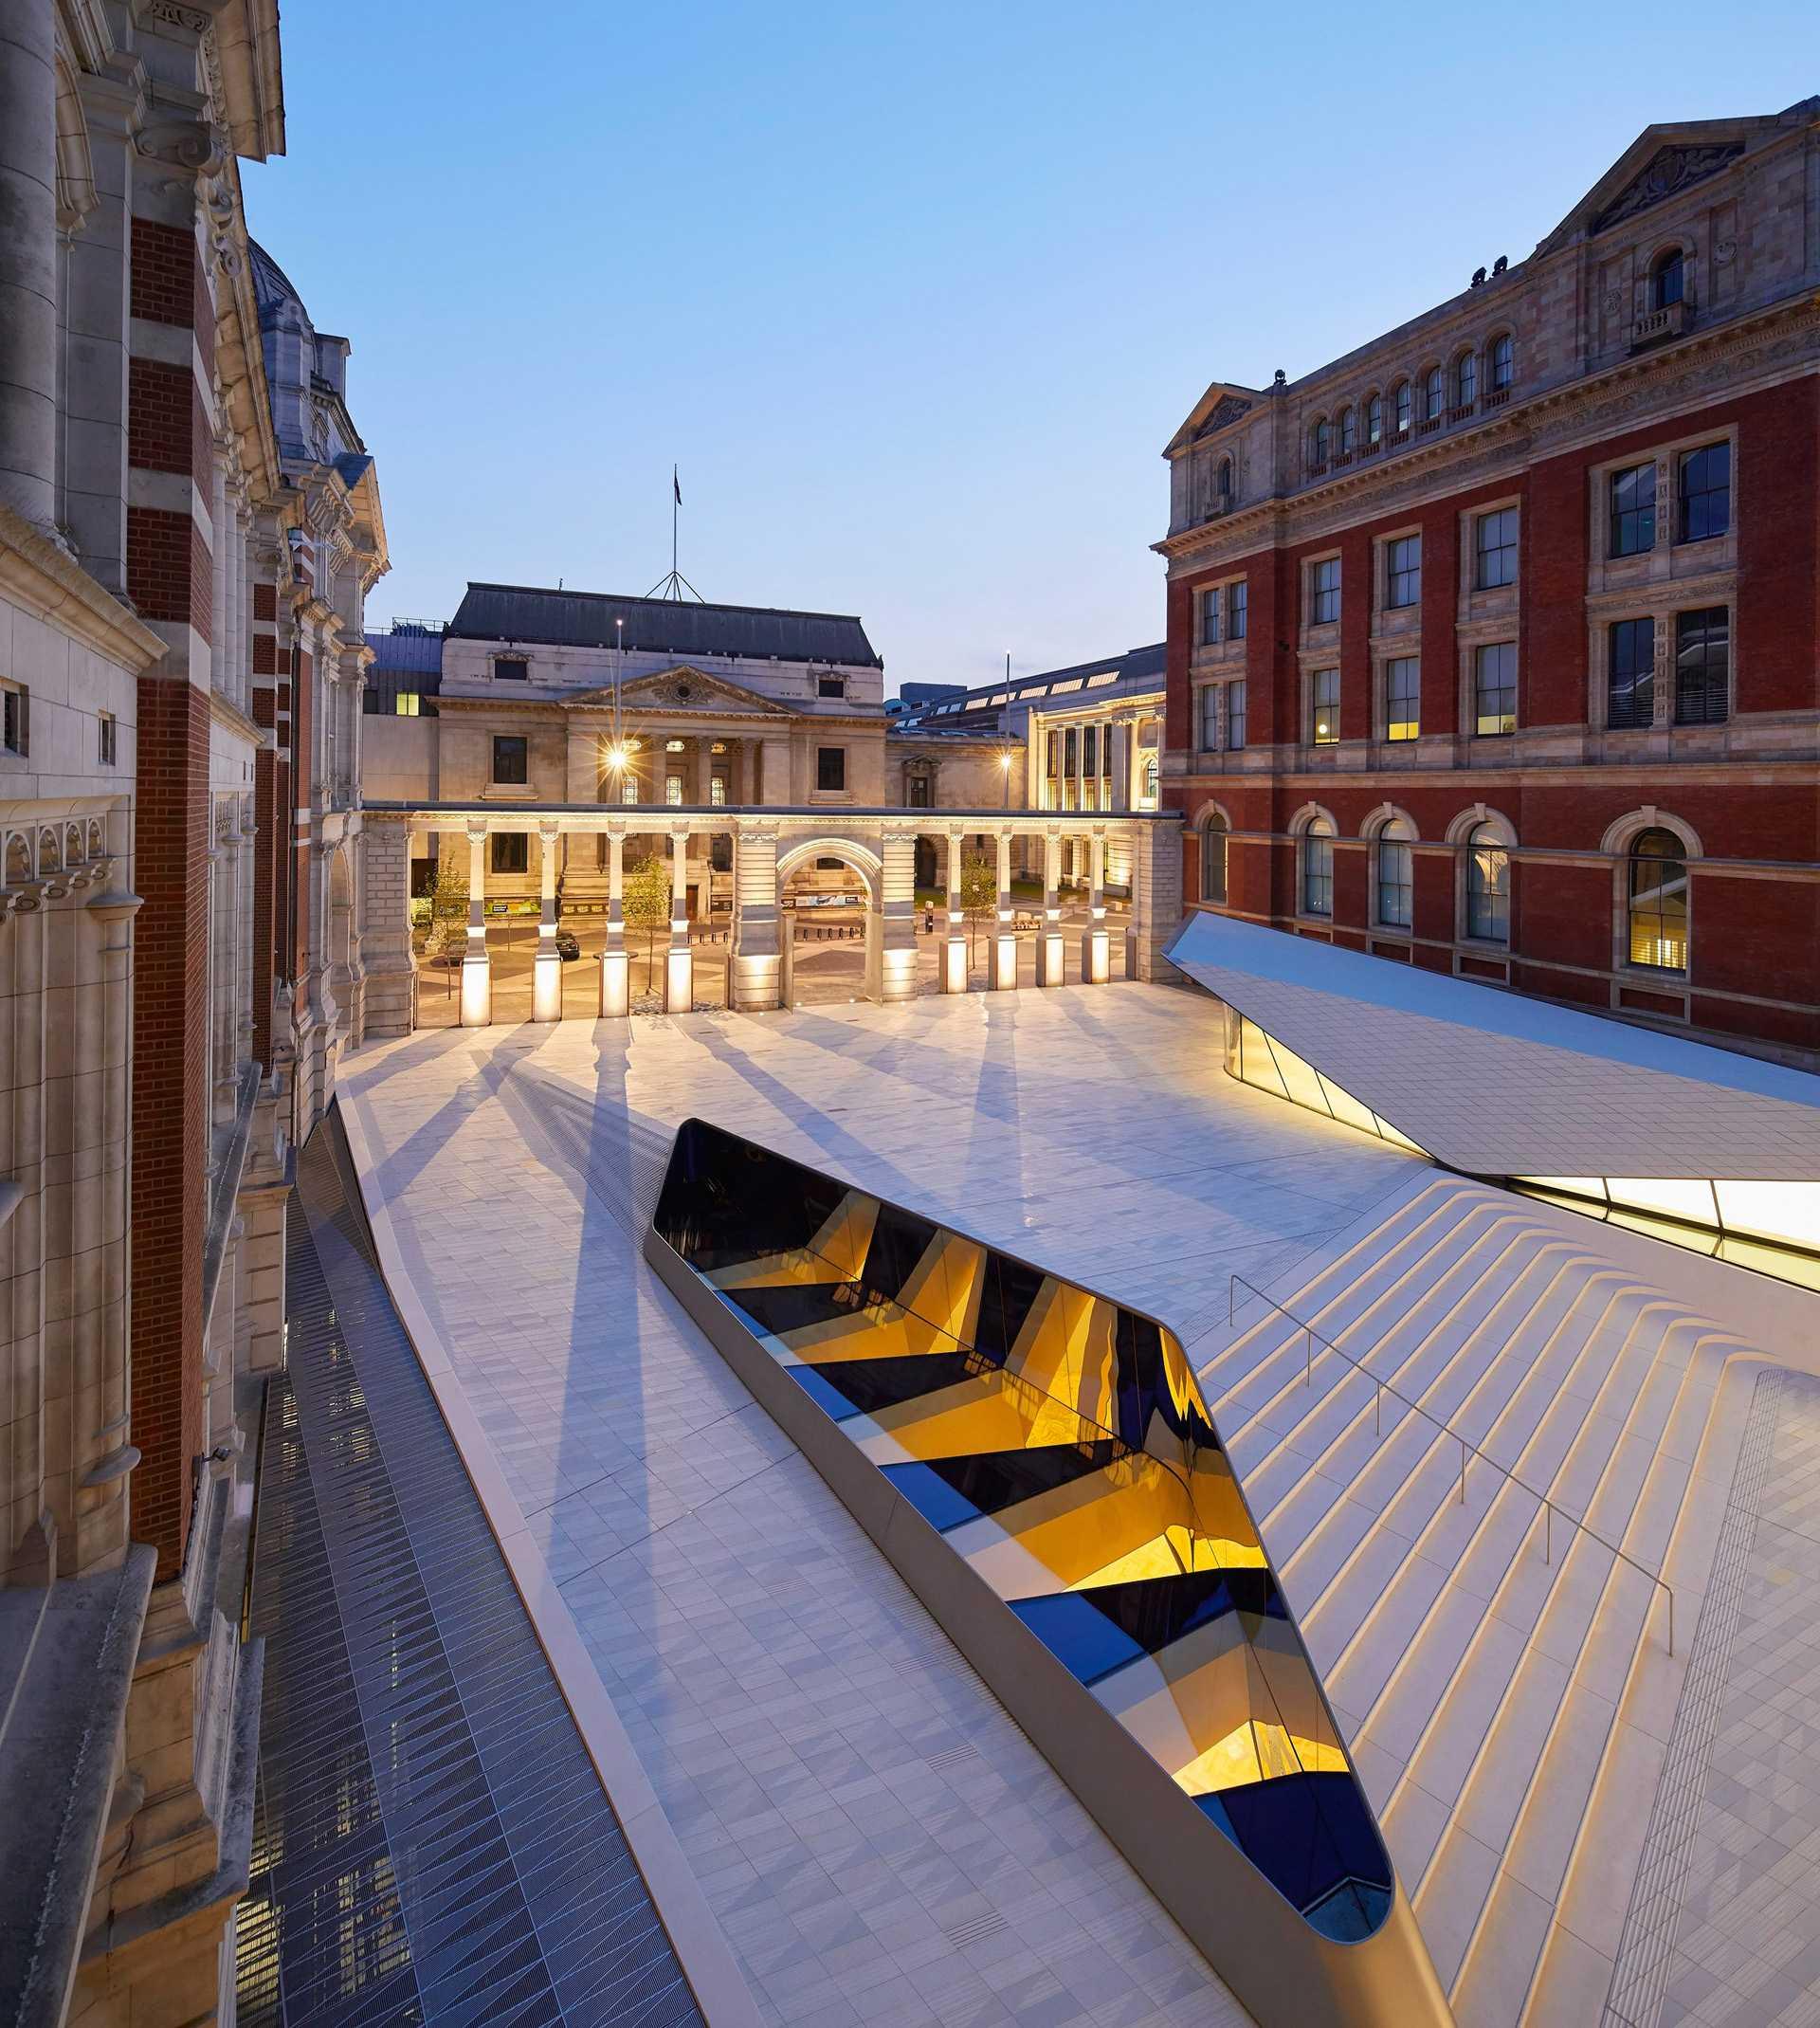 Victoria and Albert Museum  - 55 02 33